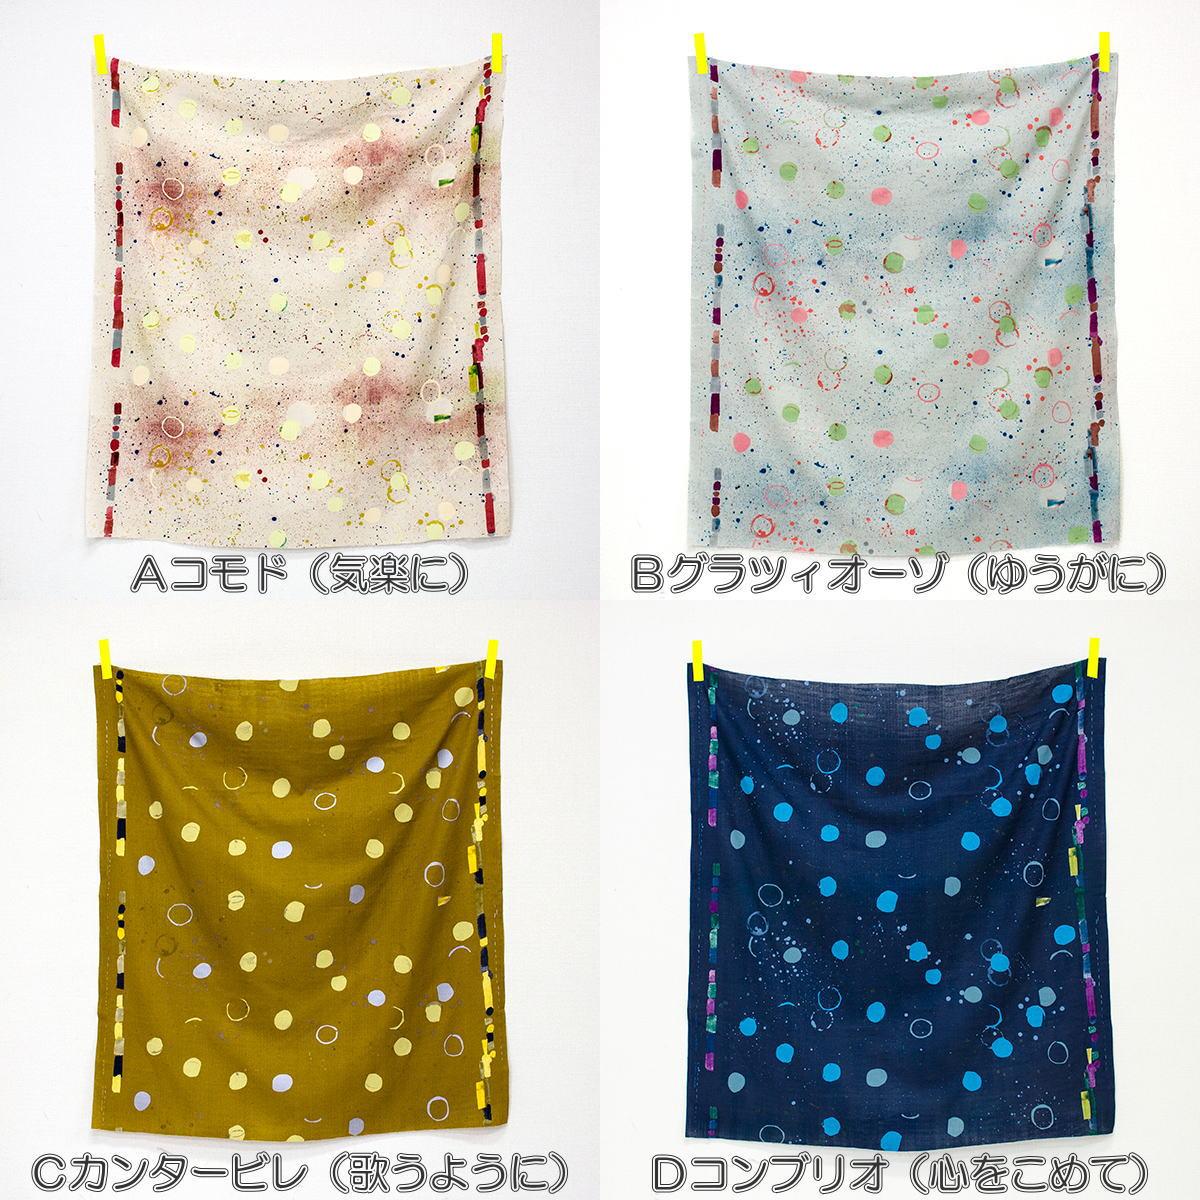 naniIRO 南宁罗湖 Ito 拿俄米双纱布绗缝织物良性循环 JGQ10240 1 商业用途不允许